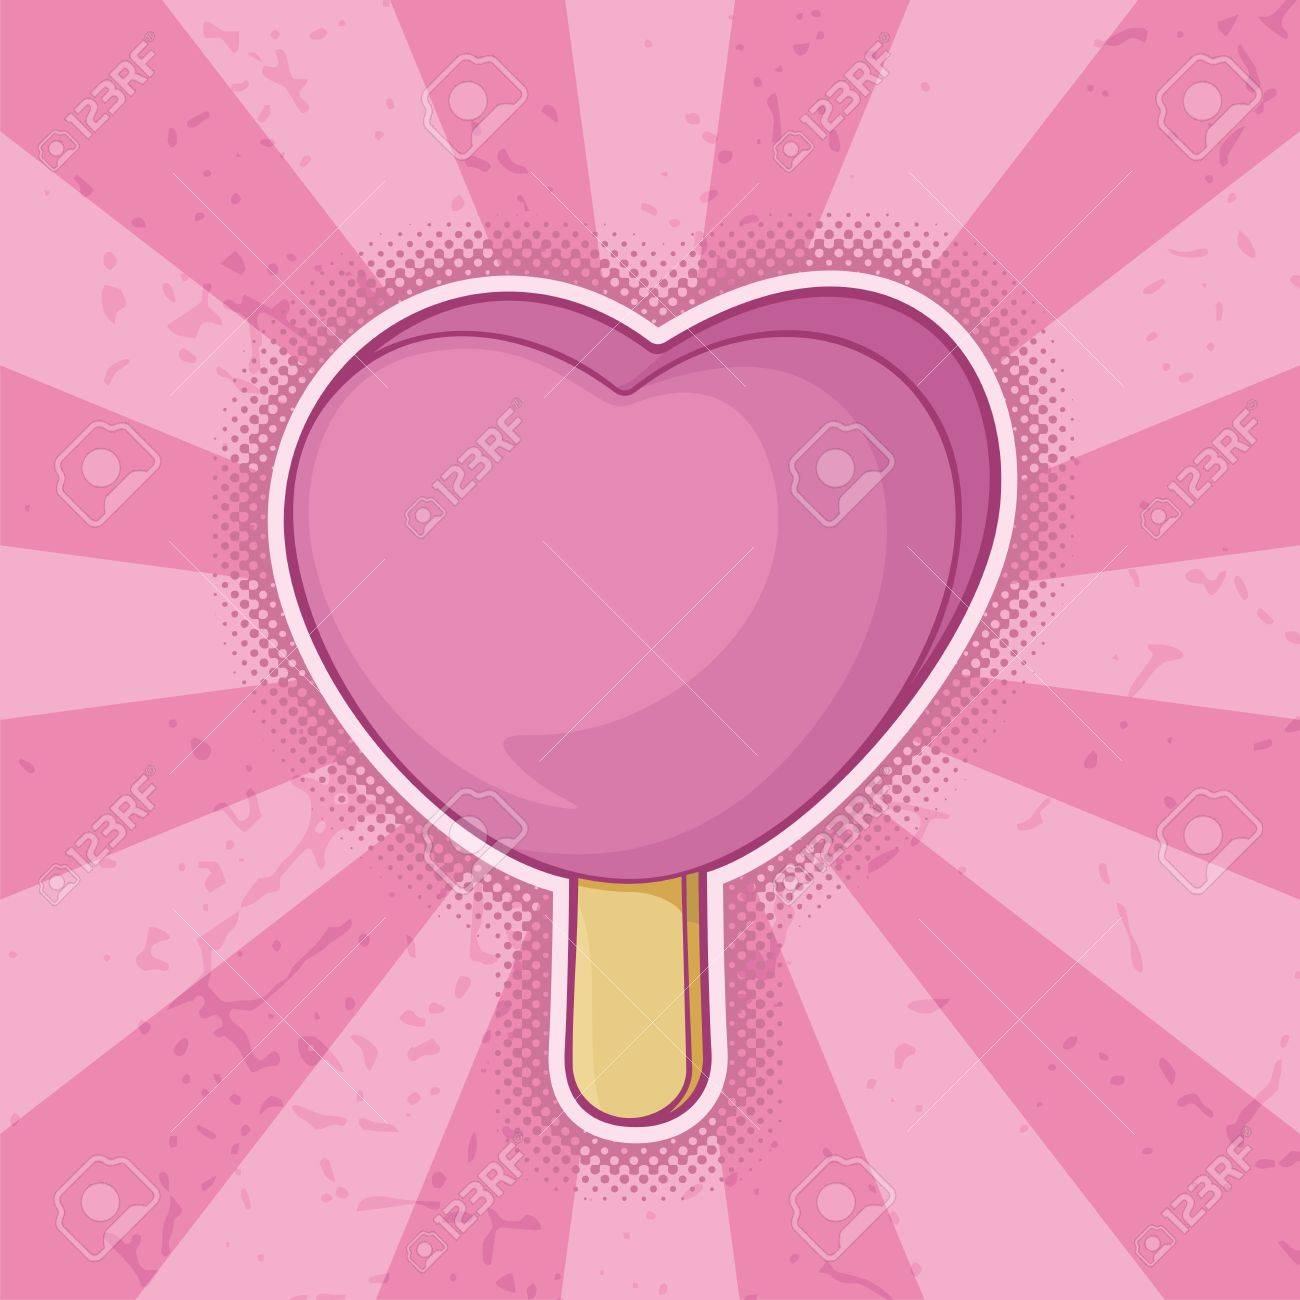 Pink heart shaped ice cream stick icon grunge background. - 14813410